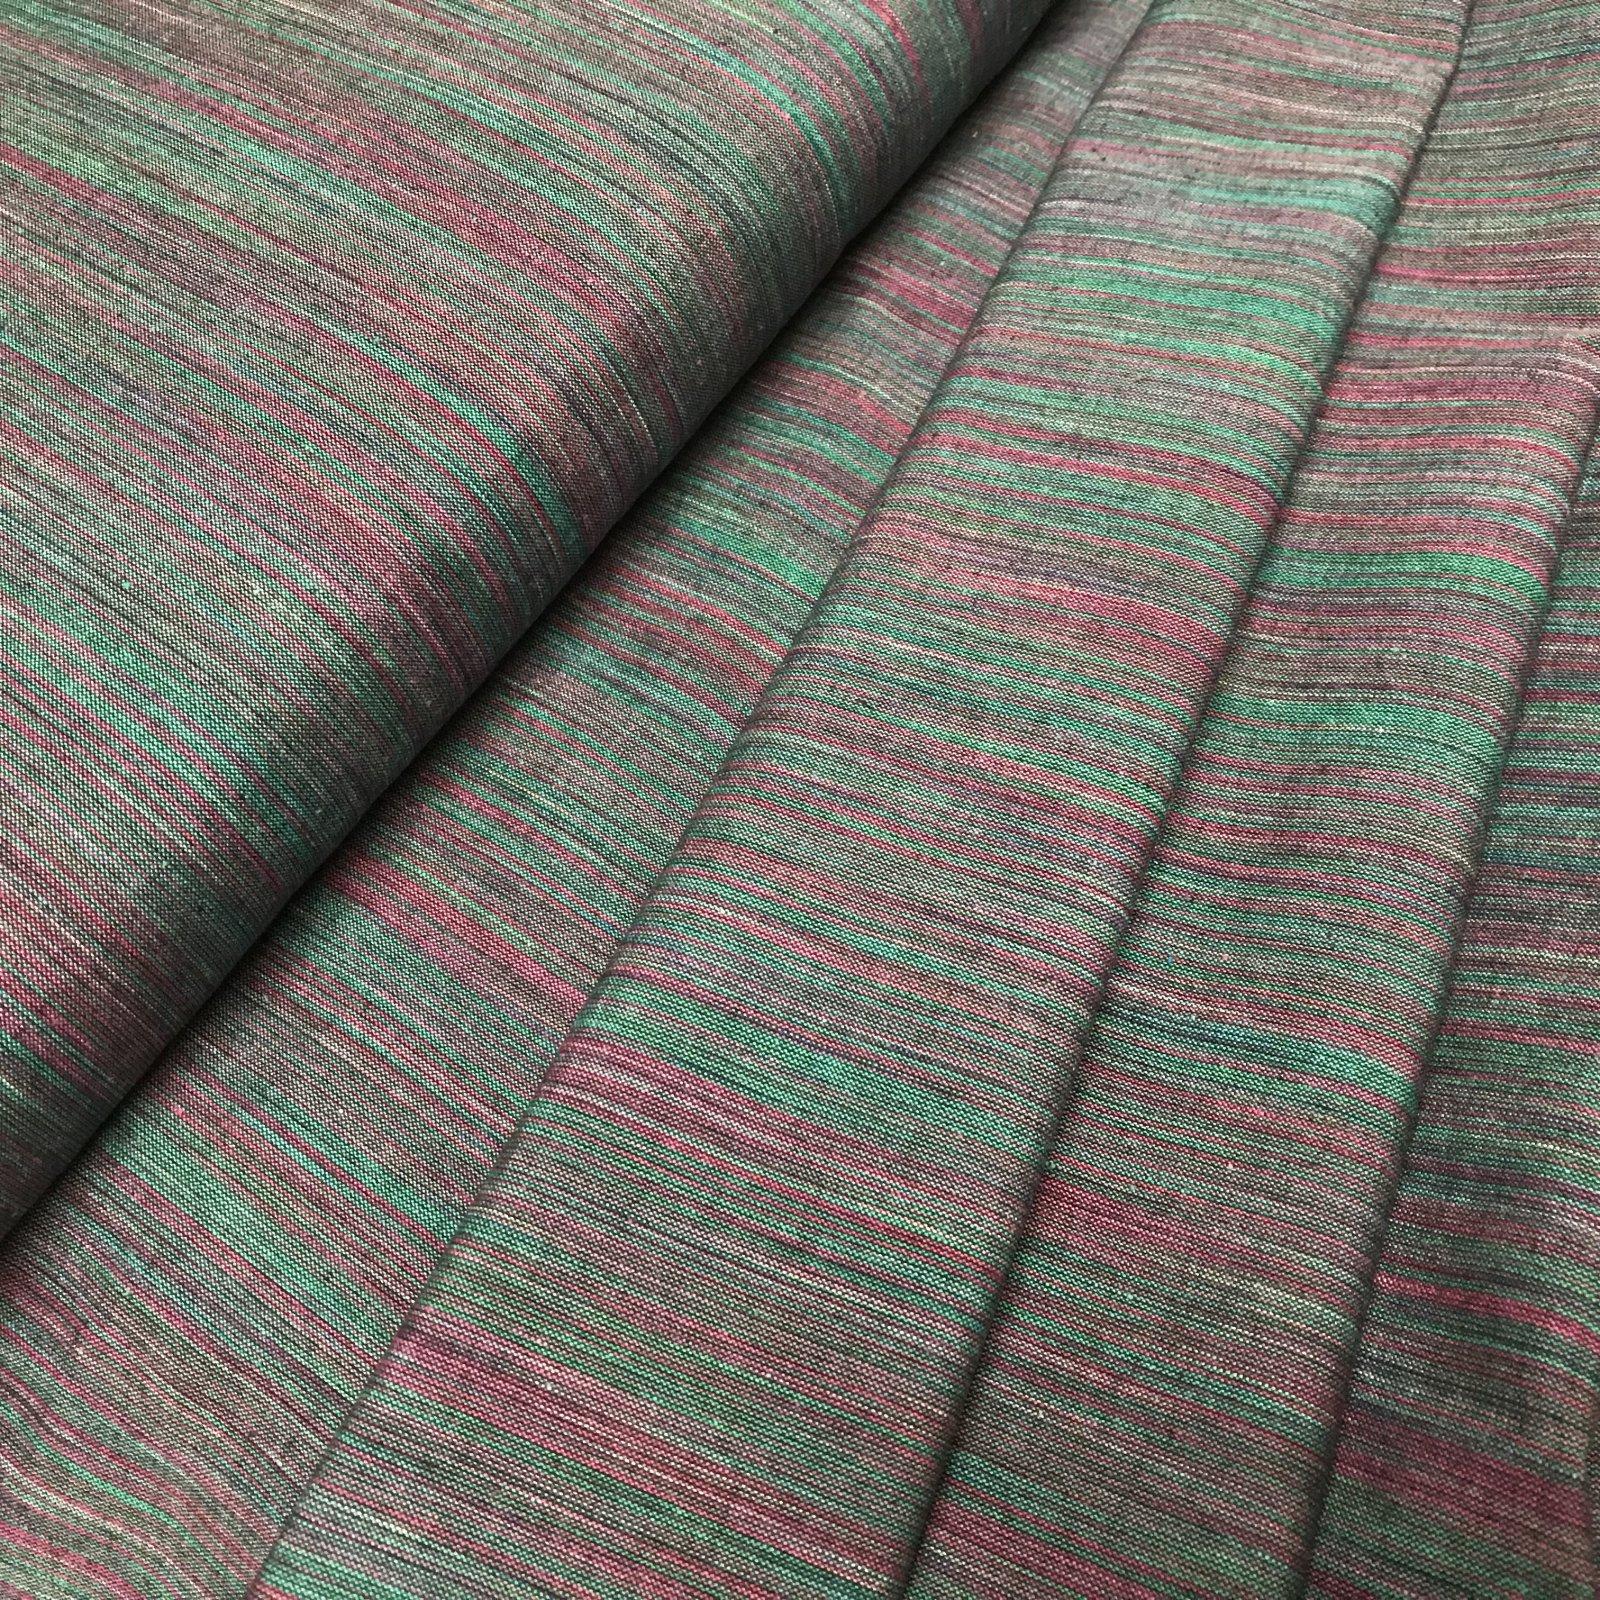 Ombre Yarn Dyed Ikat - Green & Fuchsia